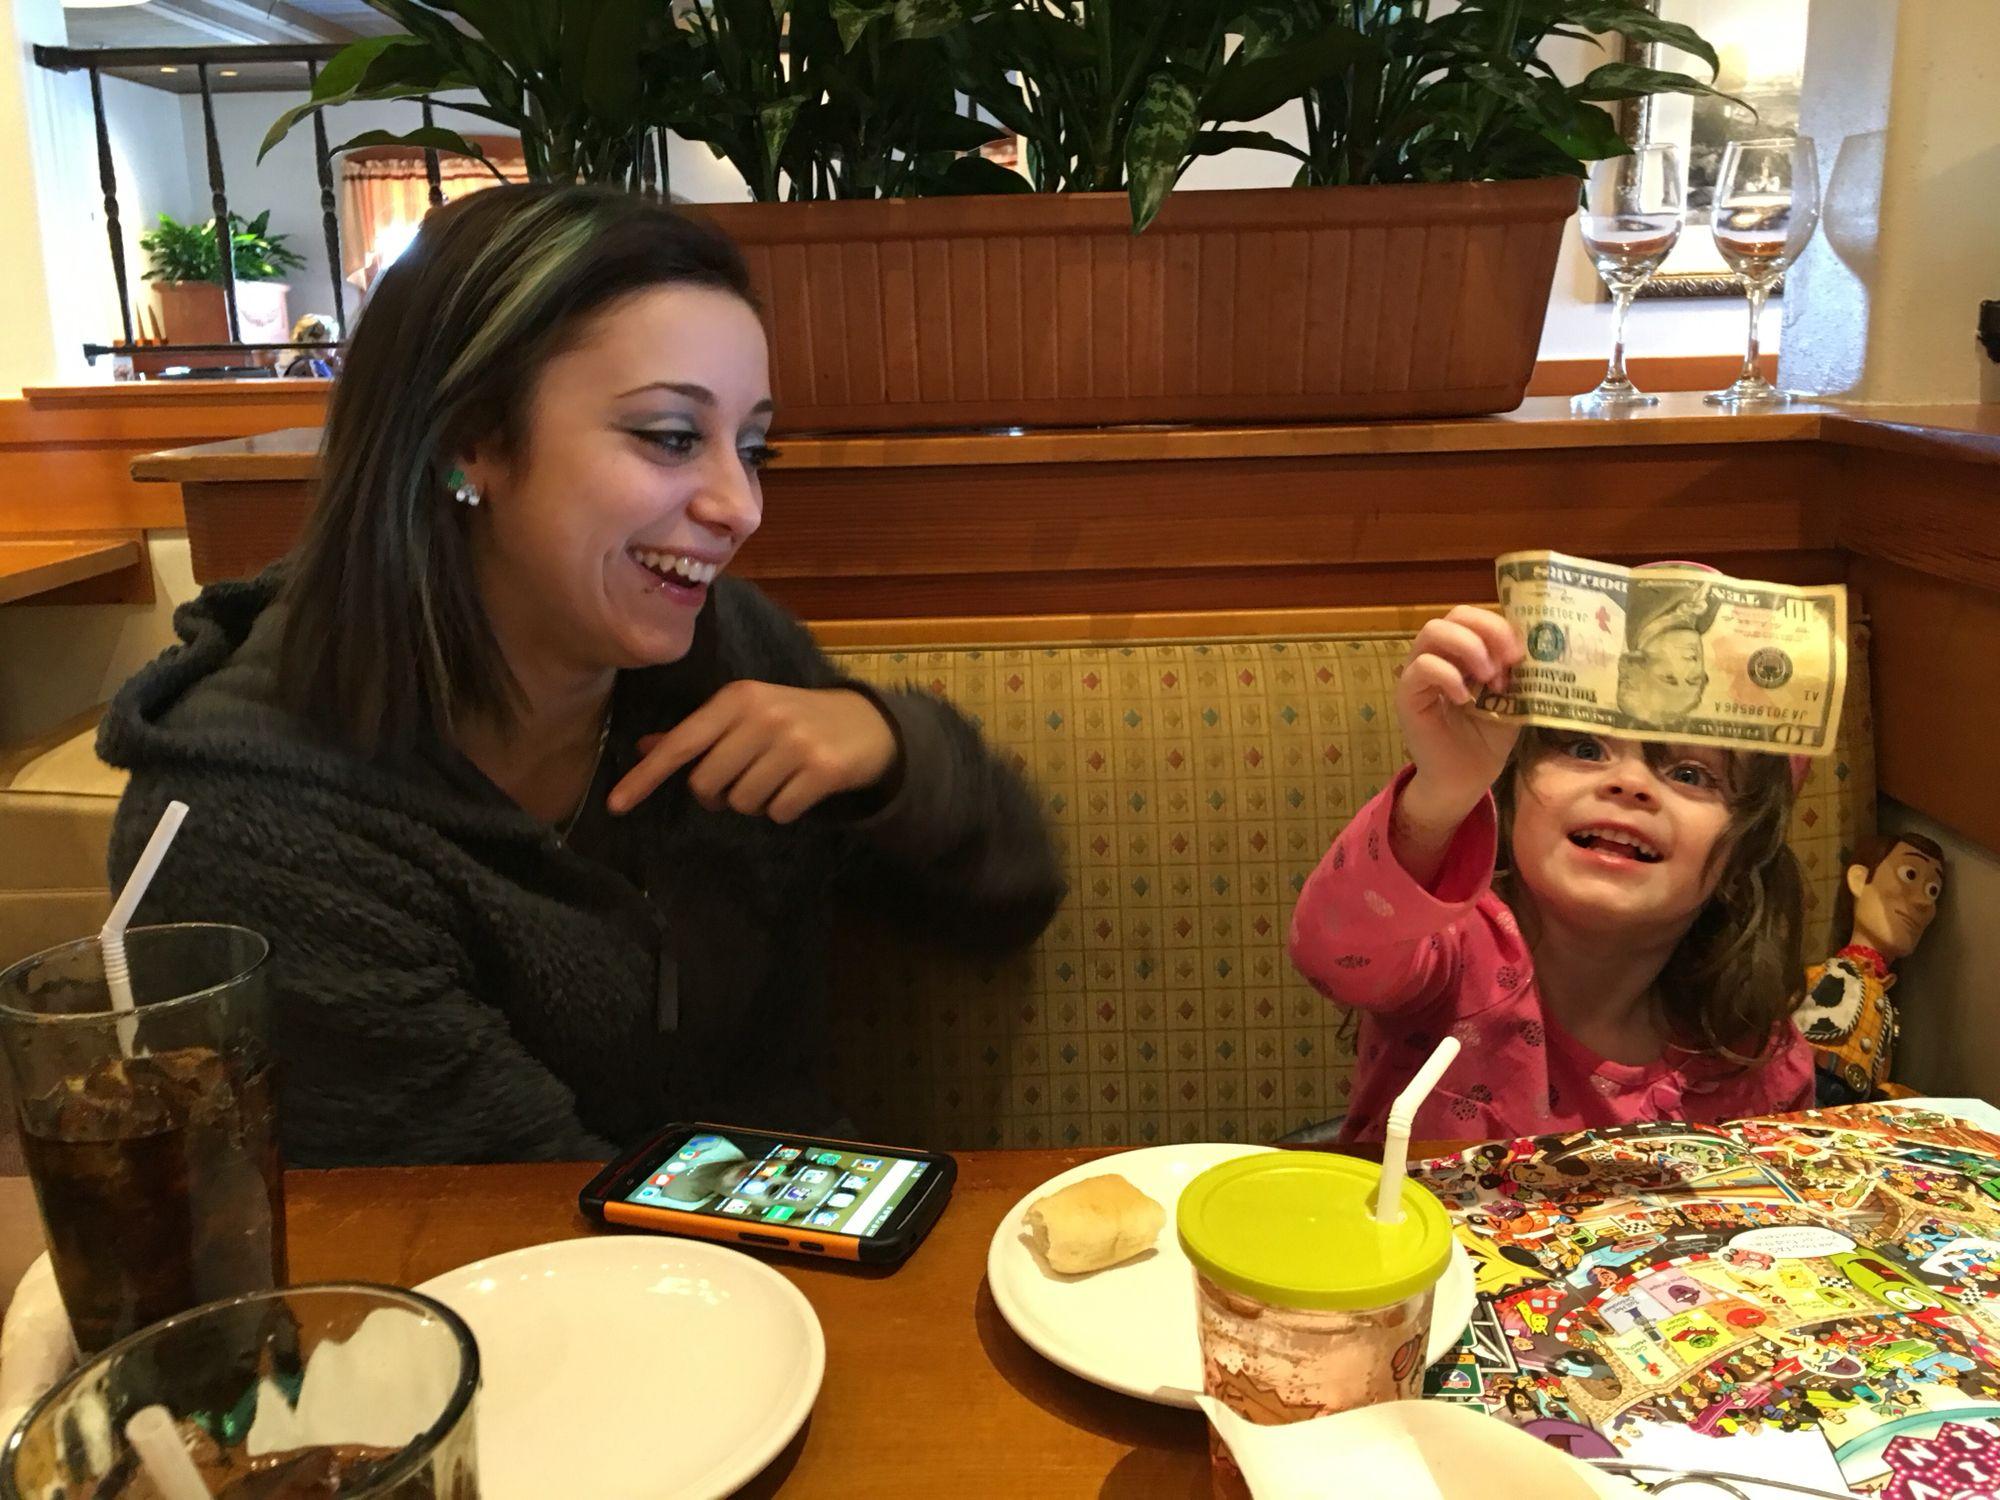 A complete stranger at Olive Garden gave my granddaughter a $10 bill ...